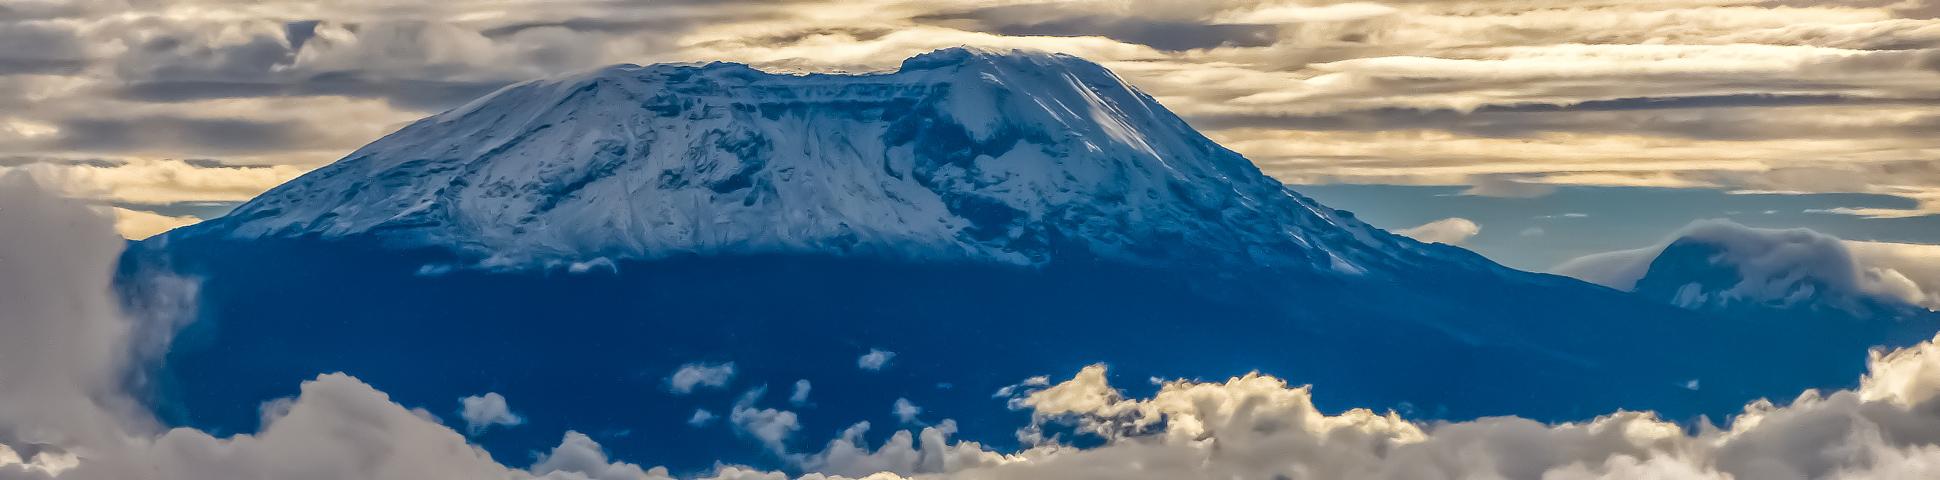 Panoramic views from Bike Tour Around Mount Kilimanjaro